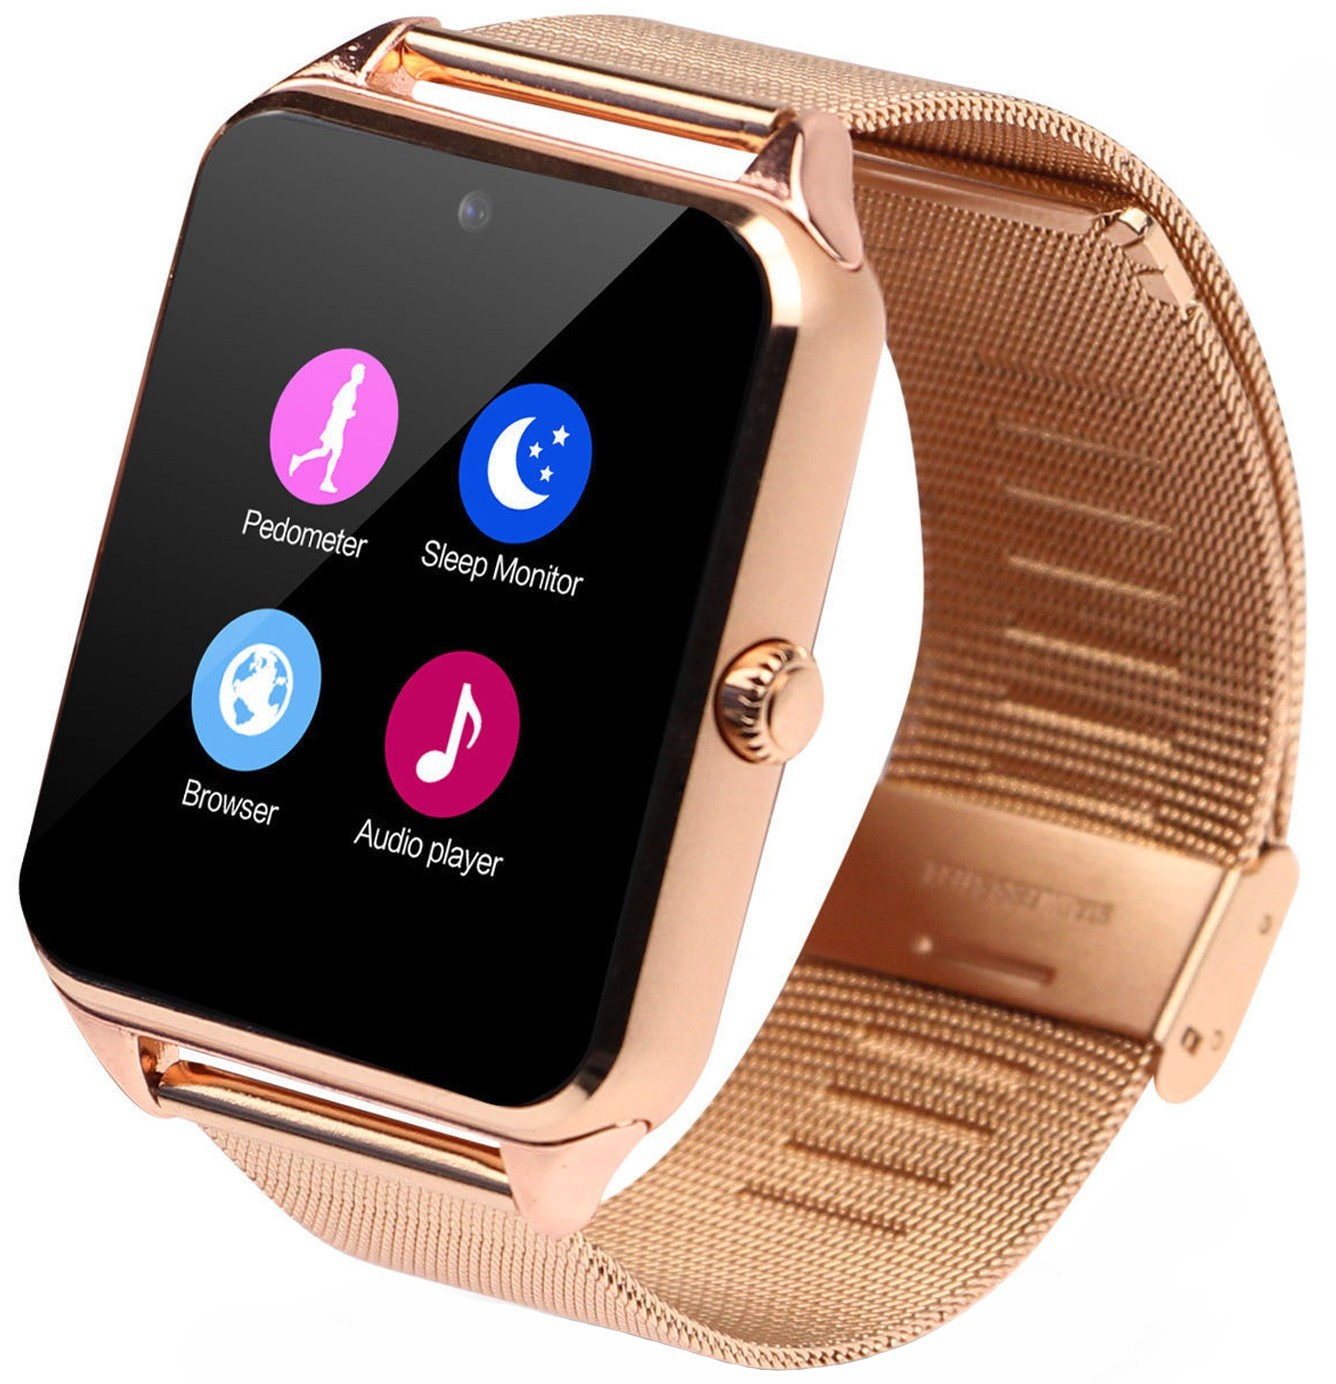 Ceas Smartwatch cu Telefon iUni Z60, Curea Metalica, Touchscreen, BT, Camera, Notificari, Gold imagine techstar.ro 2021